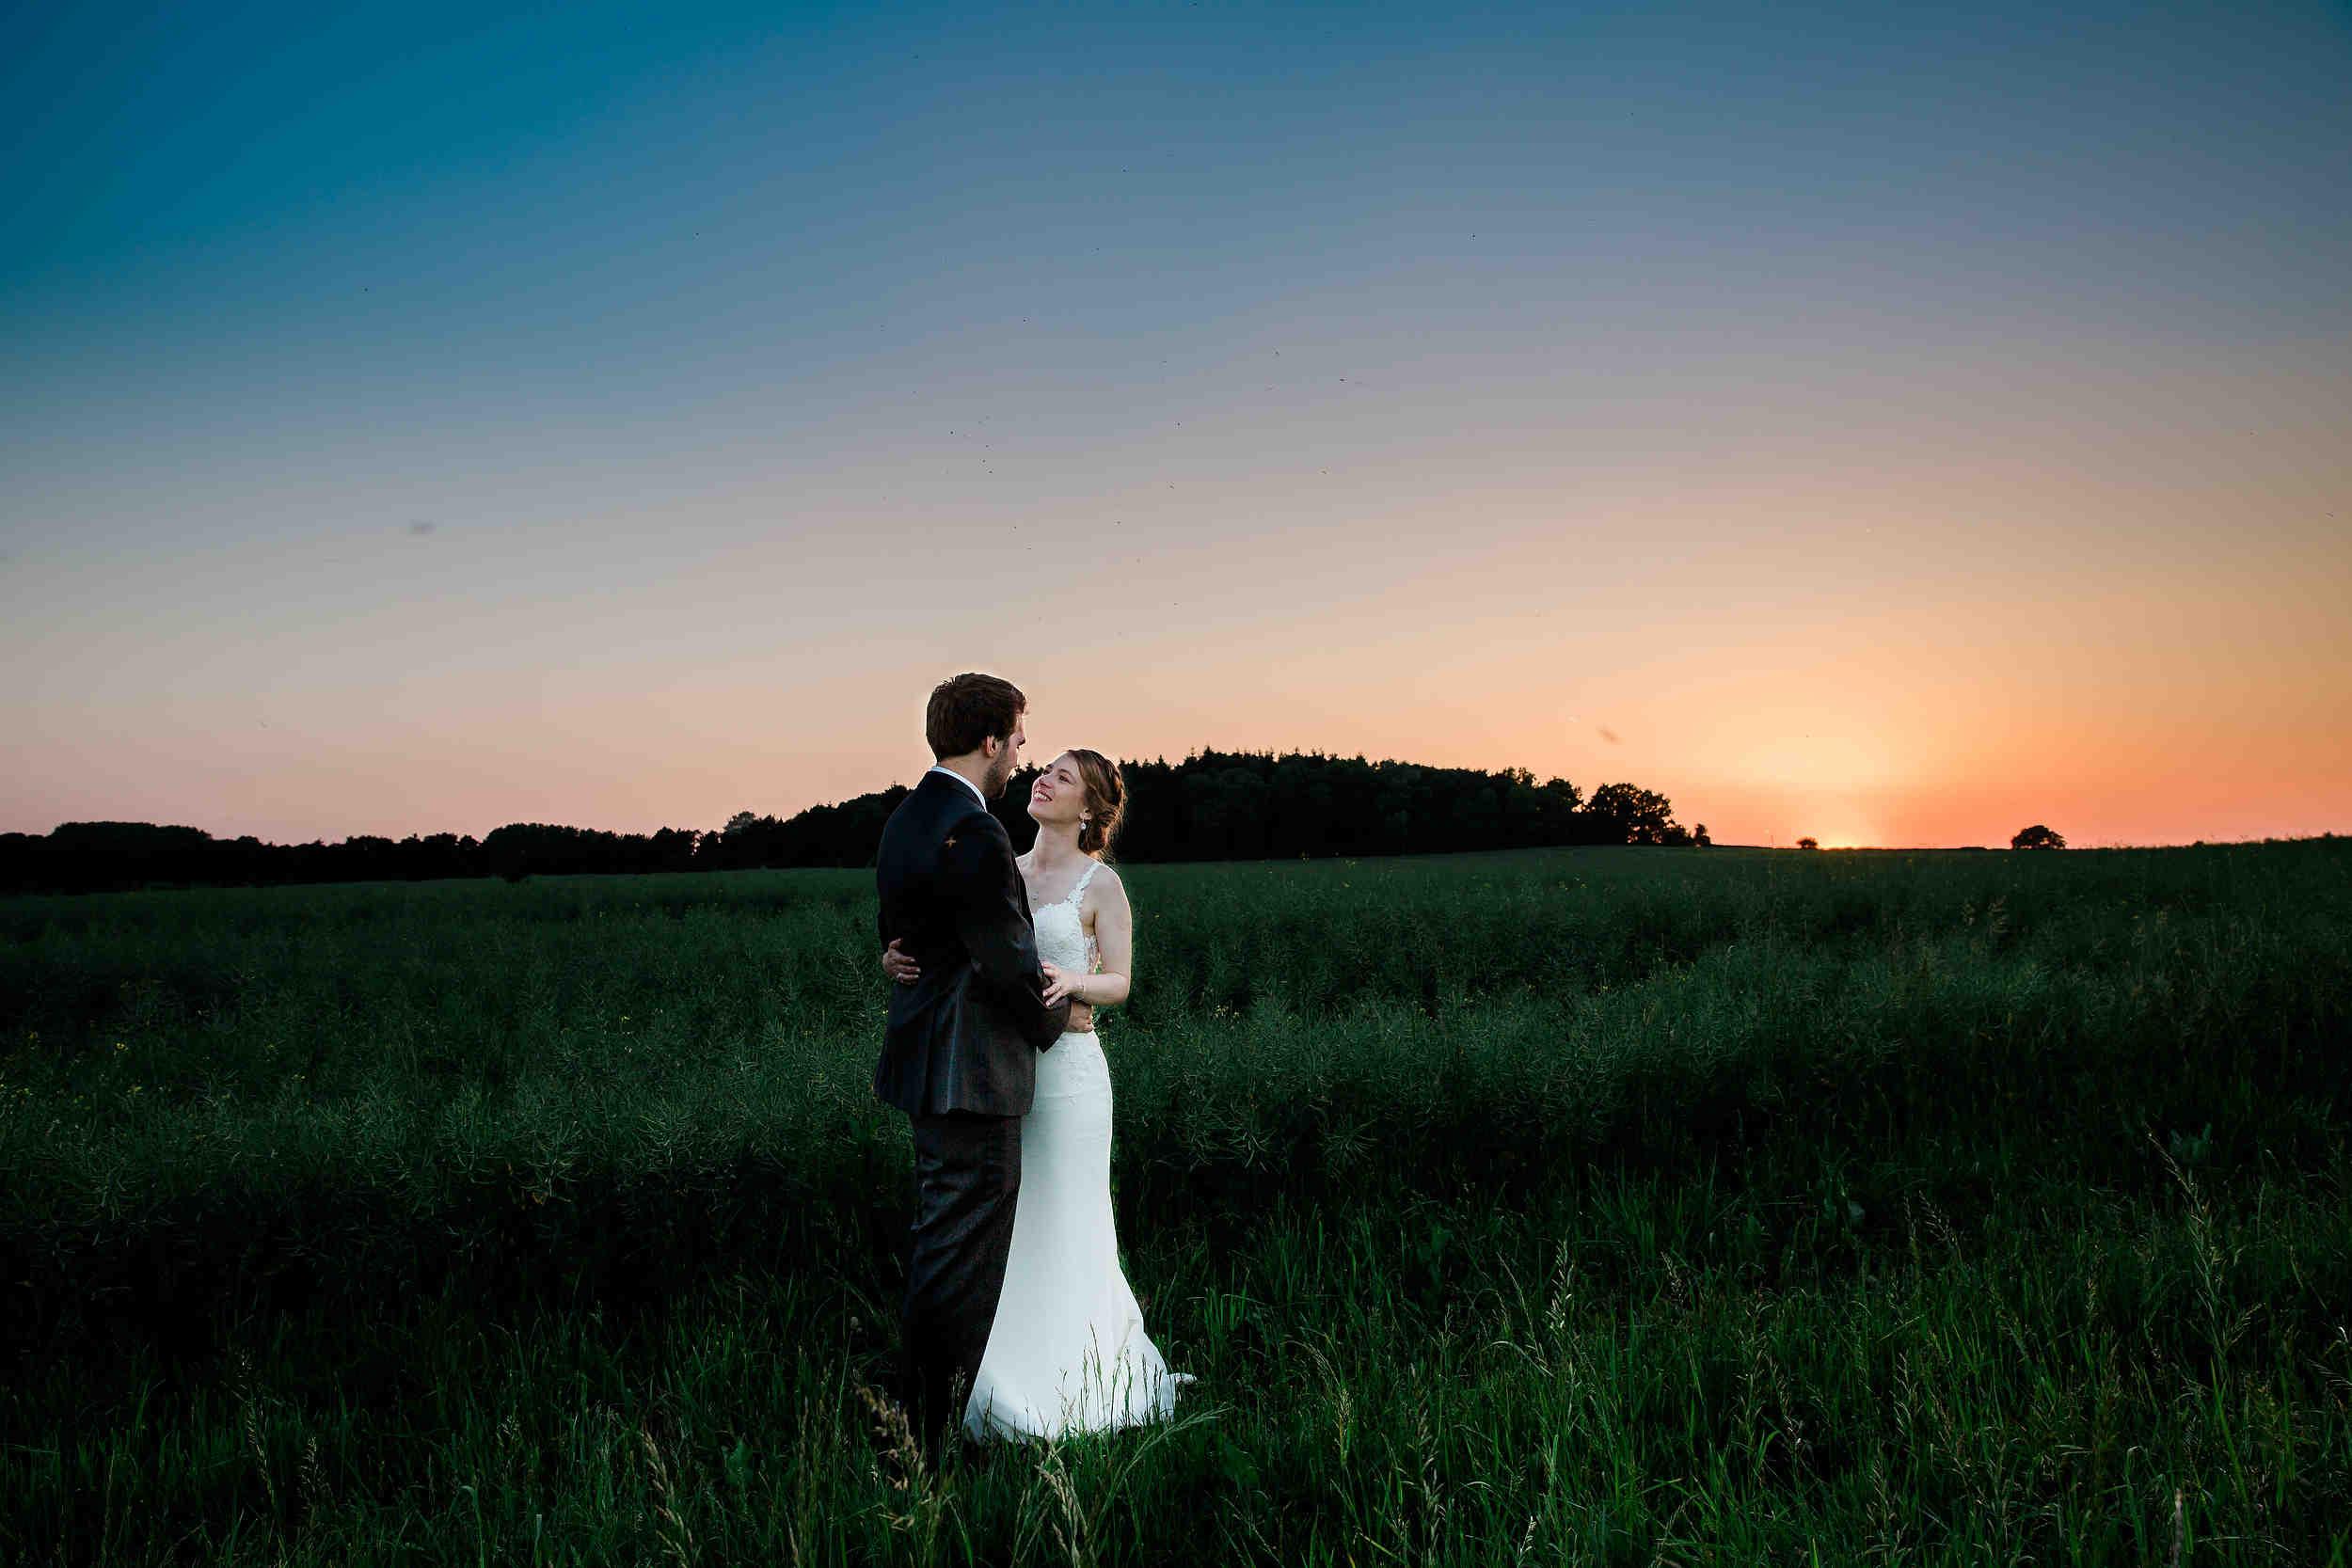 Modern Stylish Wedding at Swallows Nest Barn Sunset Portrait bride and groom